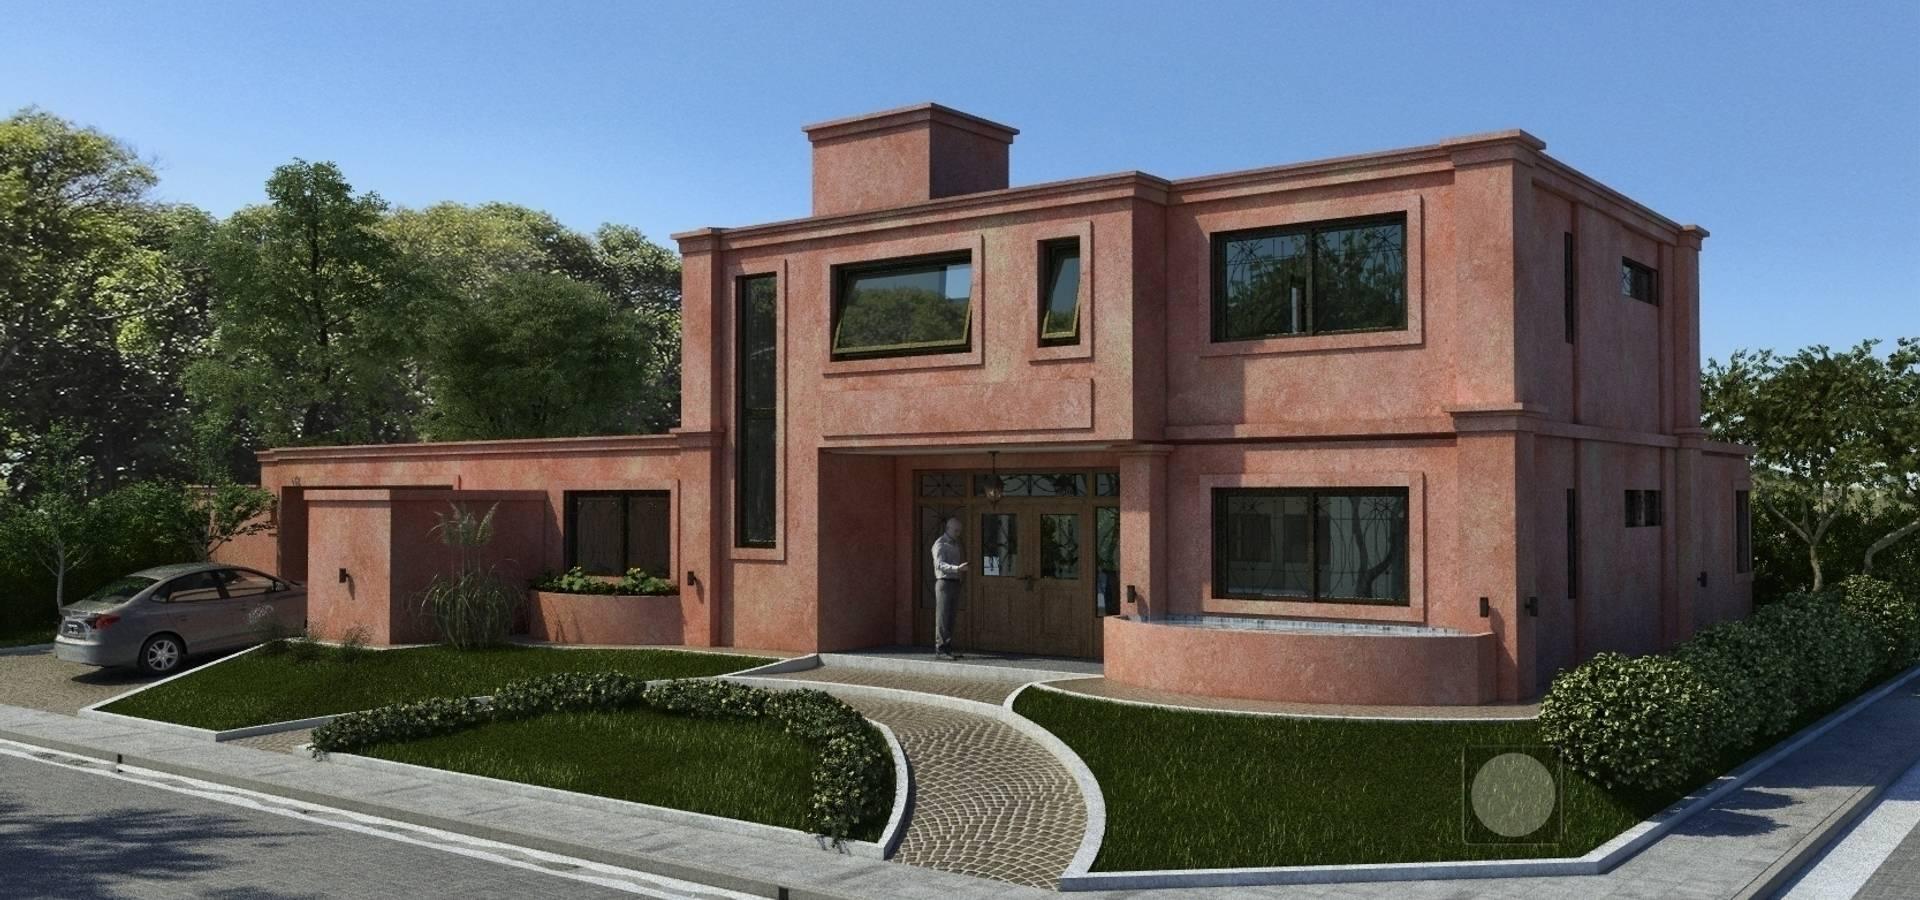 Estudio de arquitectura y dise o feng shui arquitectos en for Arquitectos en cordoba